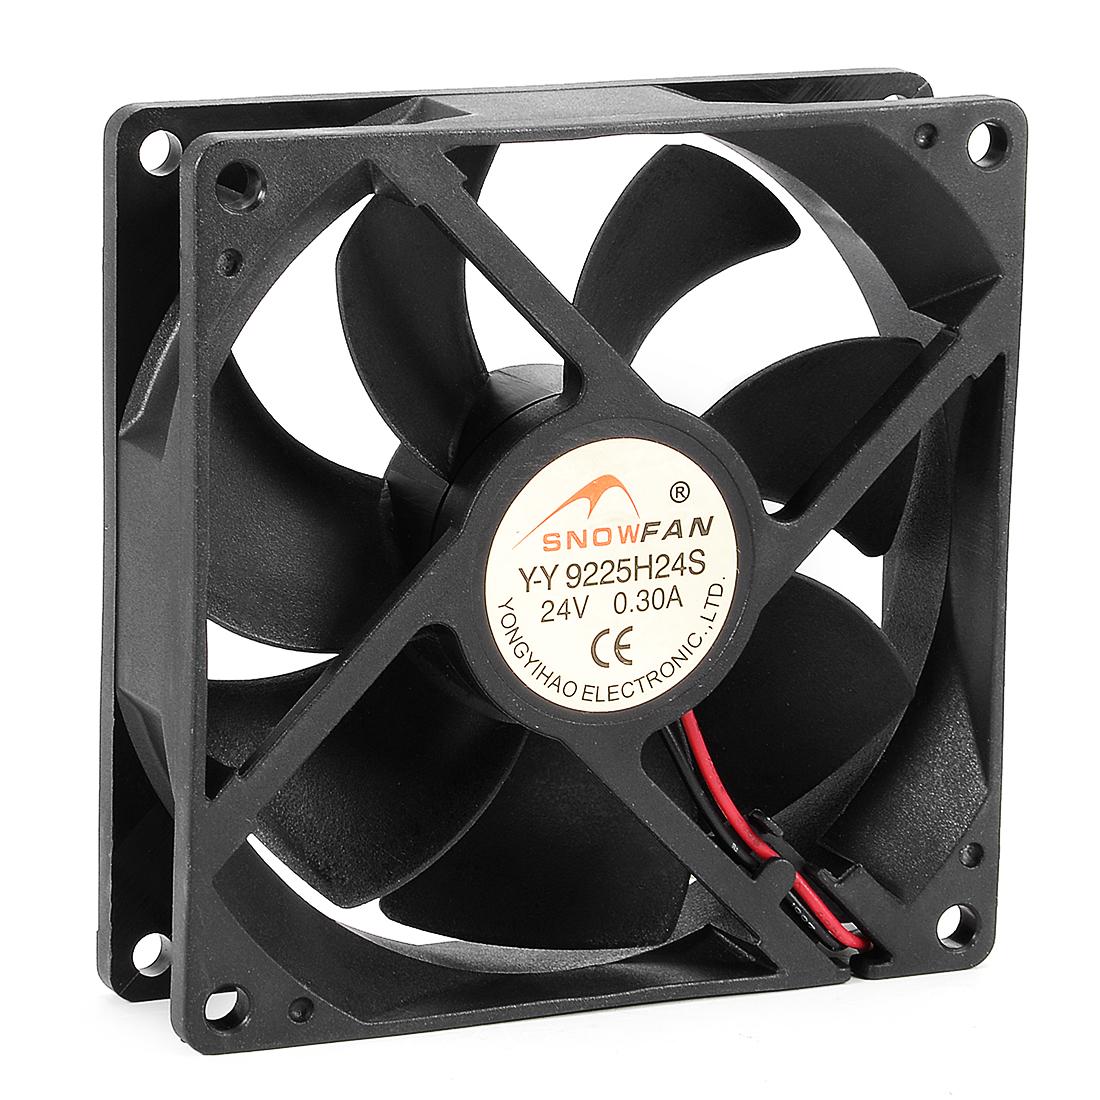 92mm x 92mm x 25mm 24V DC Cooling Fan Long Life HY Bearing Computer Case Fan